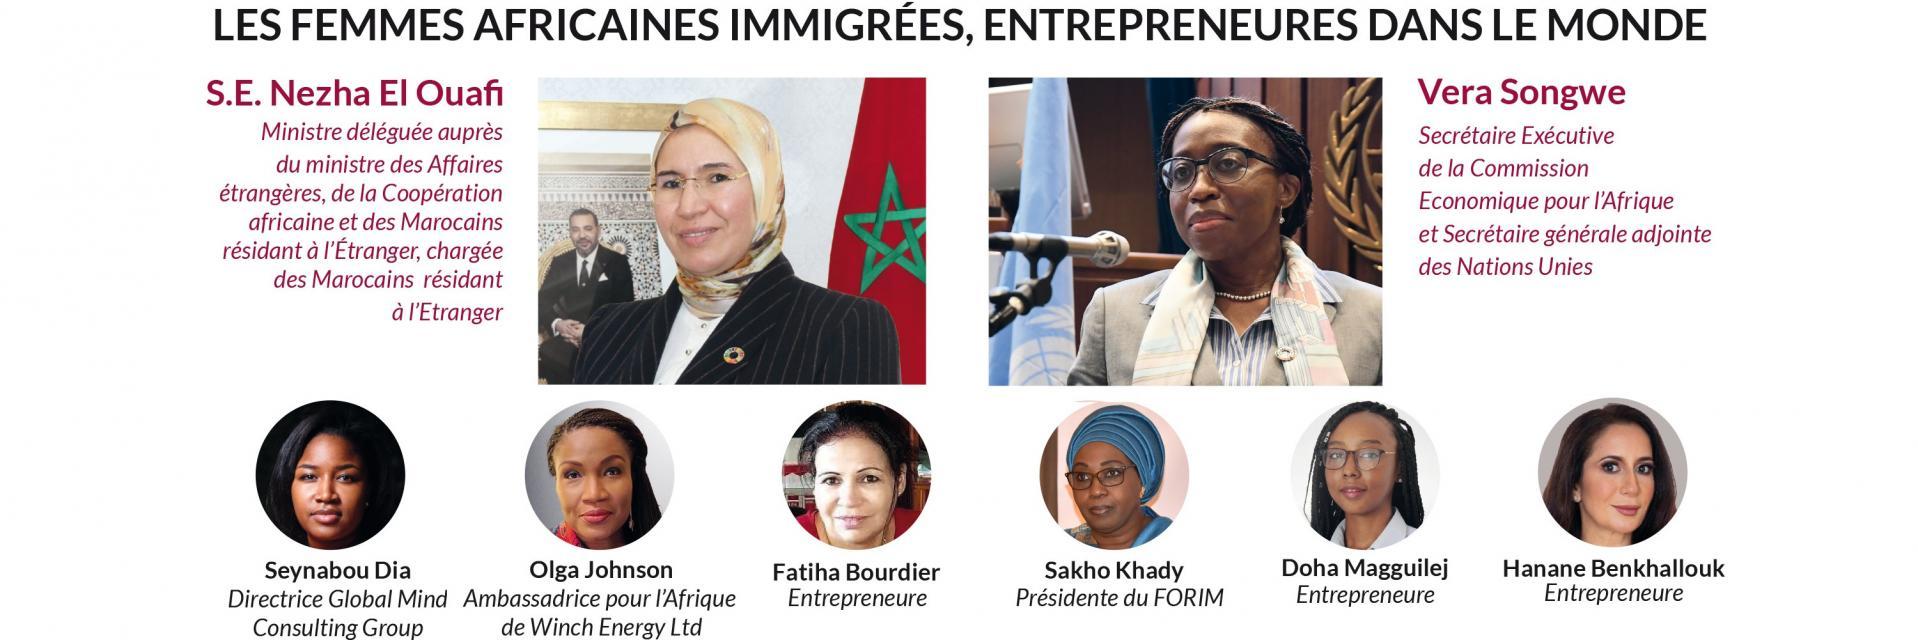 AfCFTA full of opportunities for women entrepreneurs in Morocco and Africa